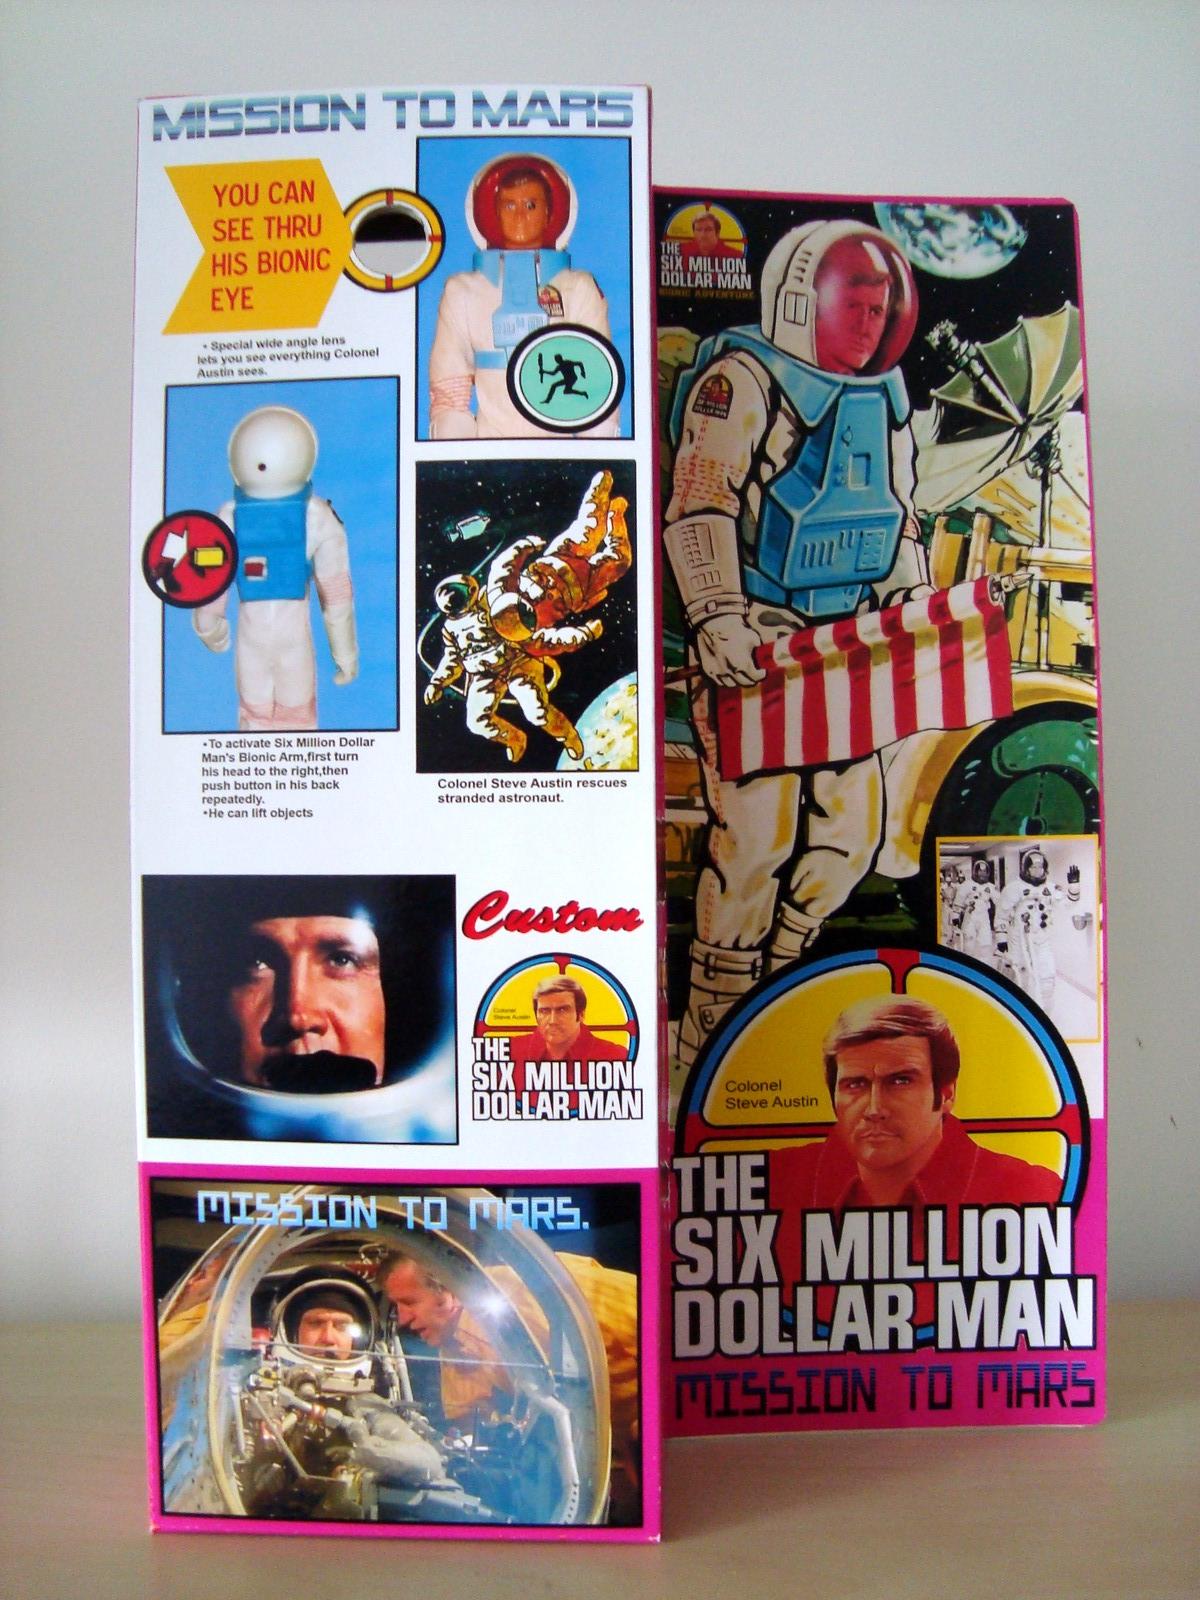 Steve Austin L'homme qui valait 3 milliards - KENNER MECCANO - Page 11 170909113214285669